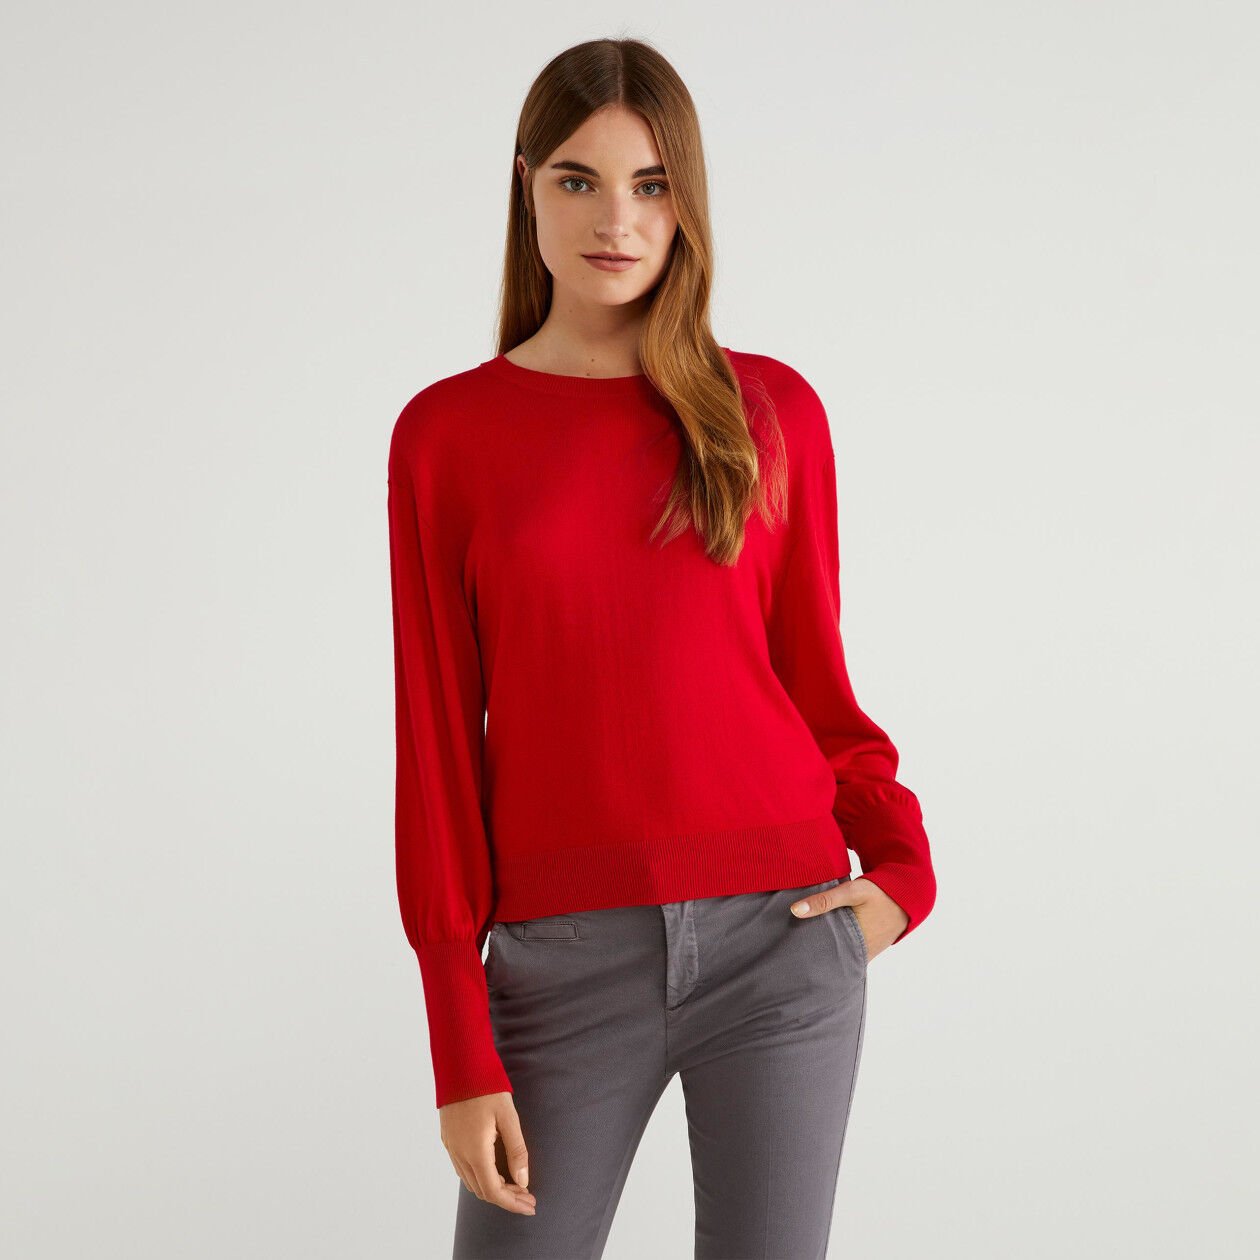 Jersey con mangas abullonadas